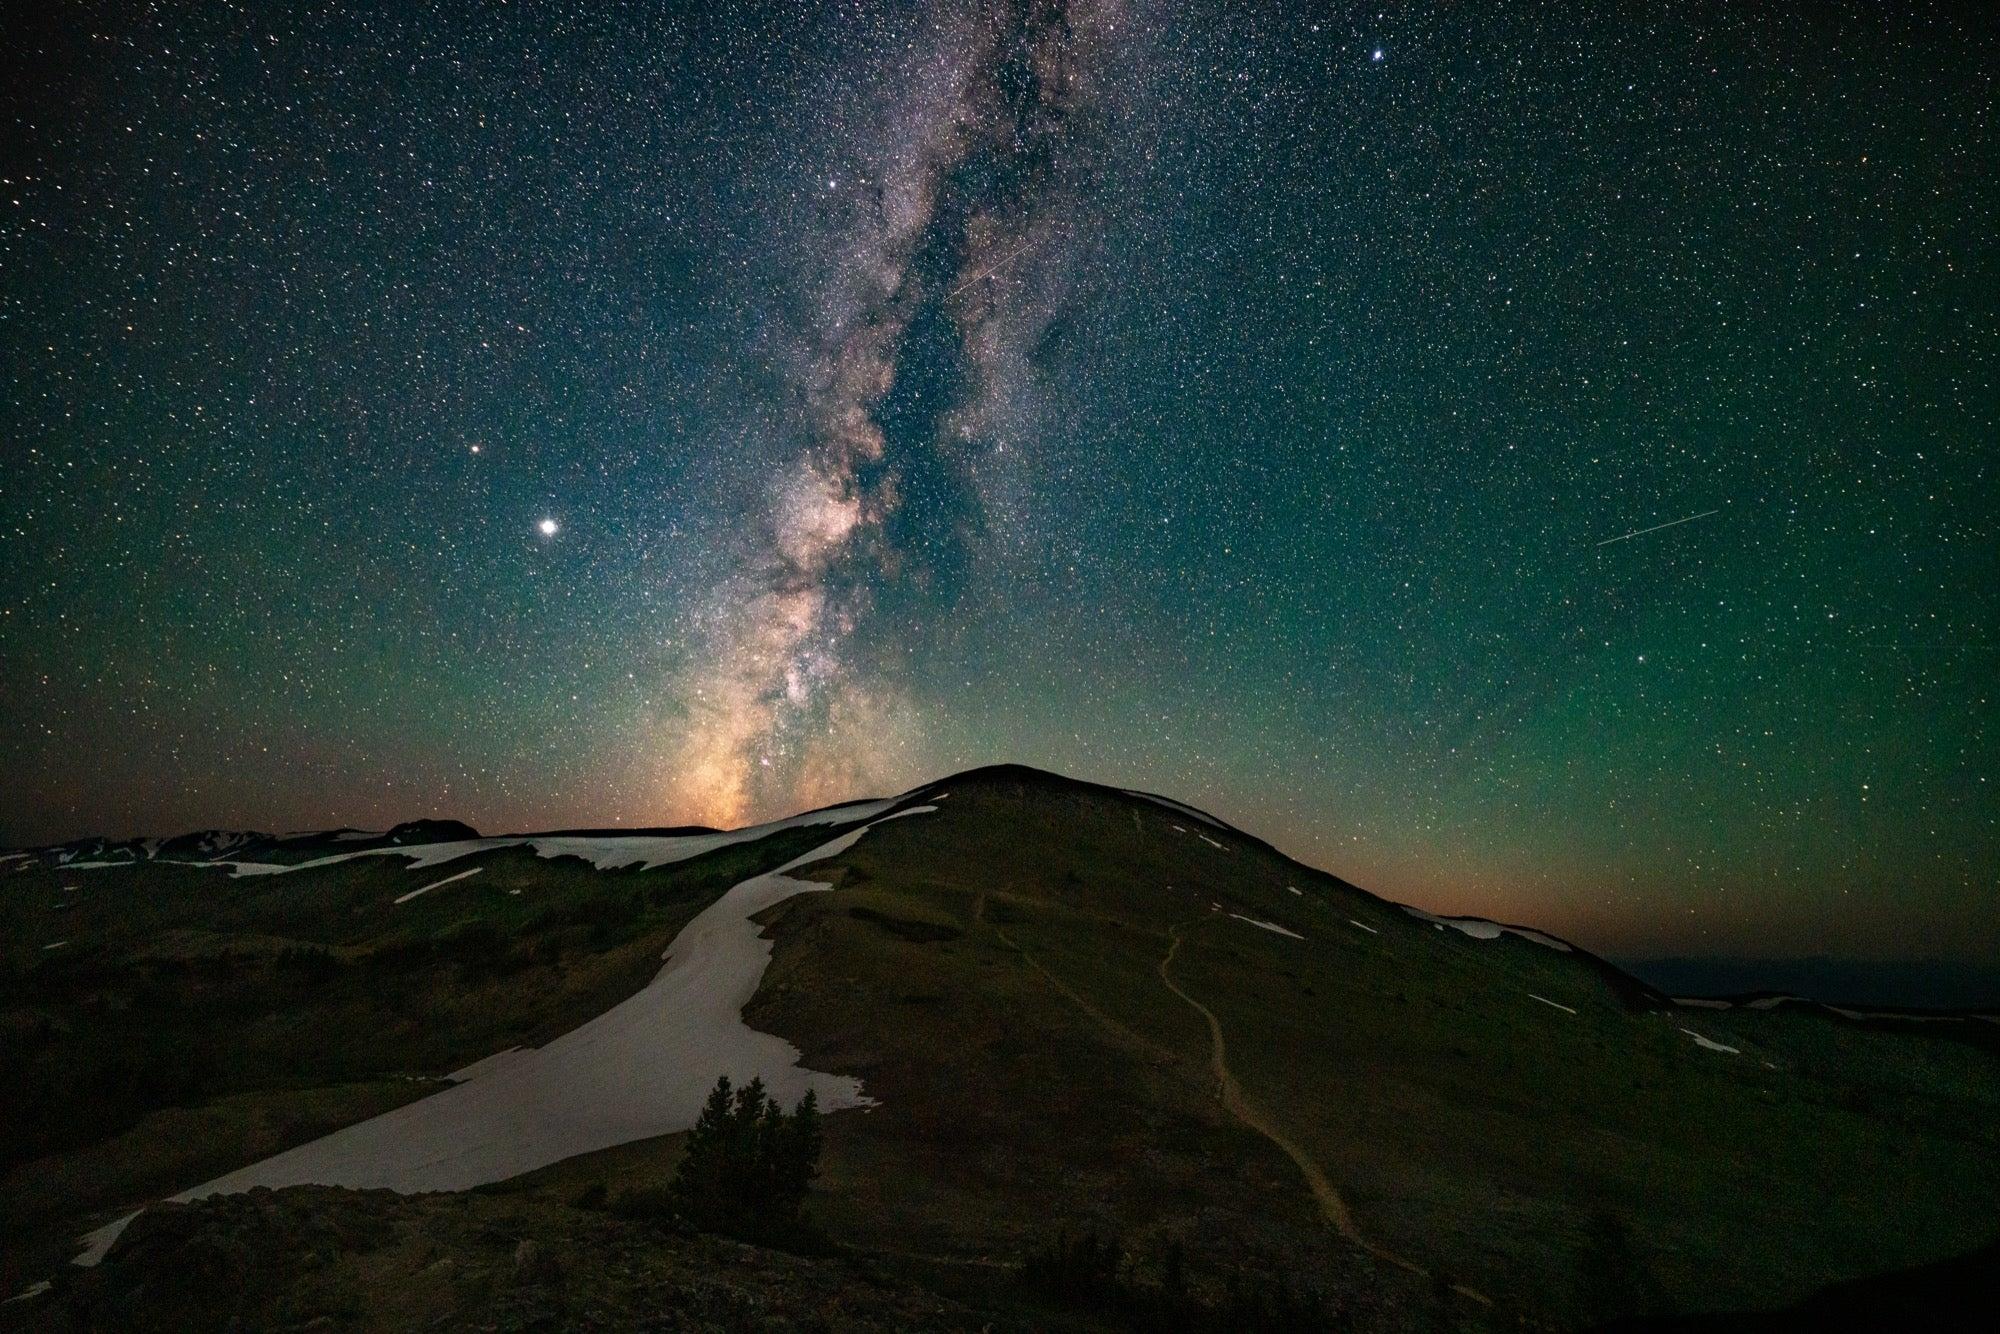 Alpha-Universe-photo-by-Andy-Mann-Sony-12-24mm-G-MasterAJM07619-2.jpg